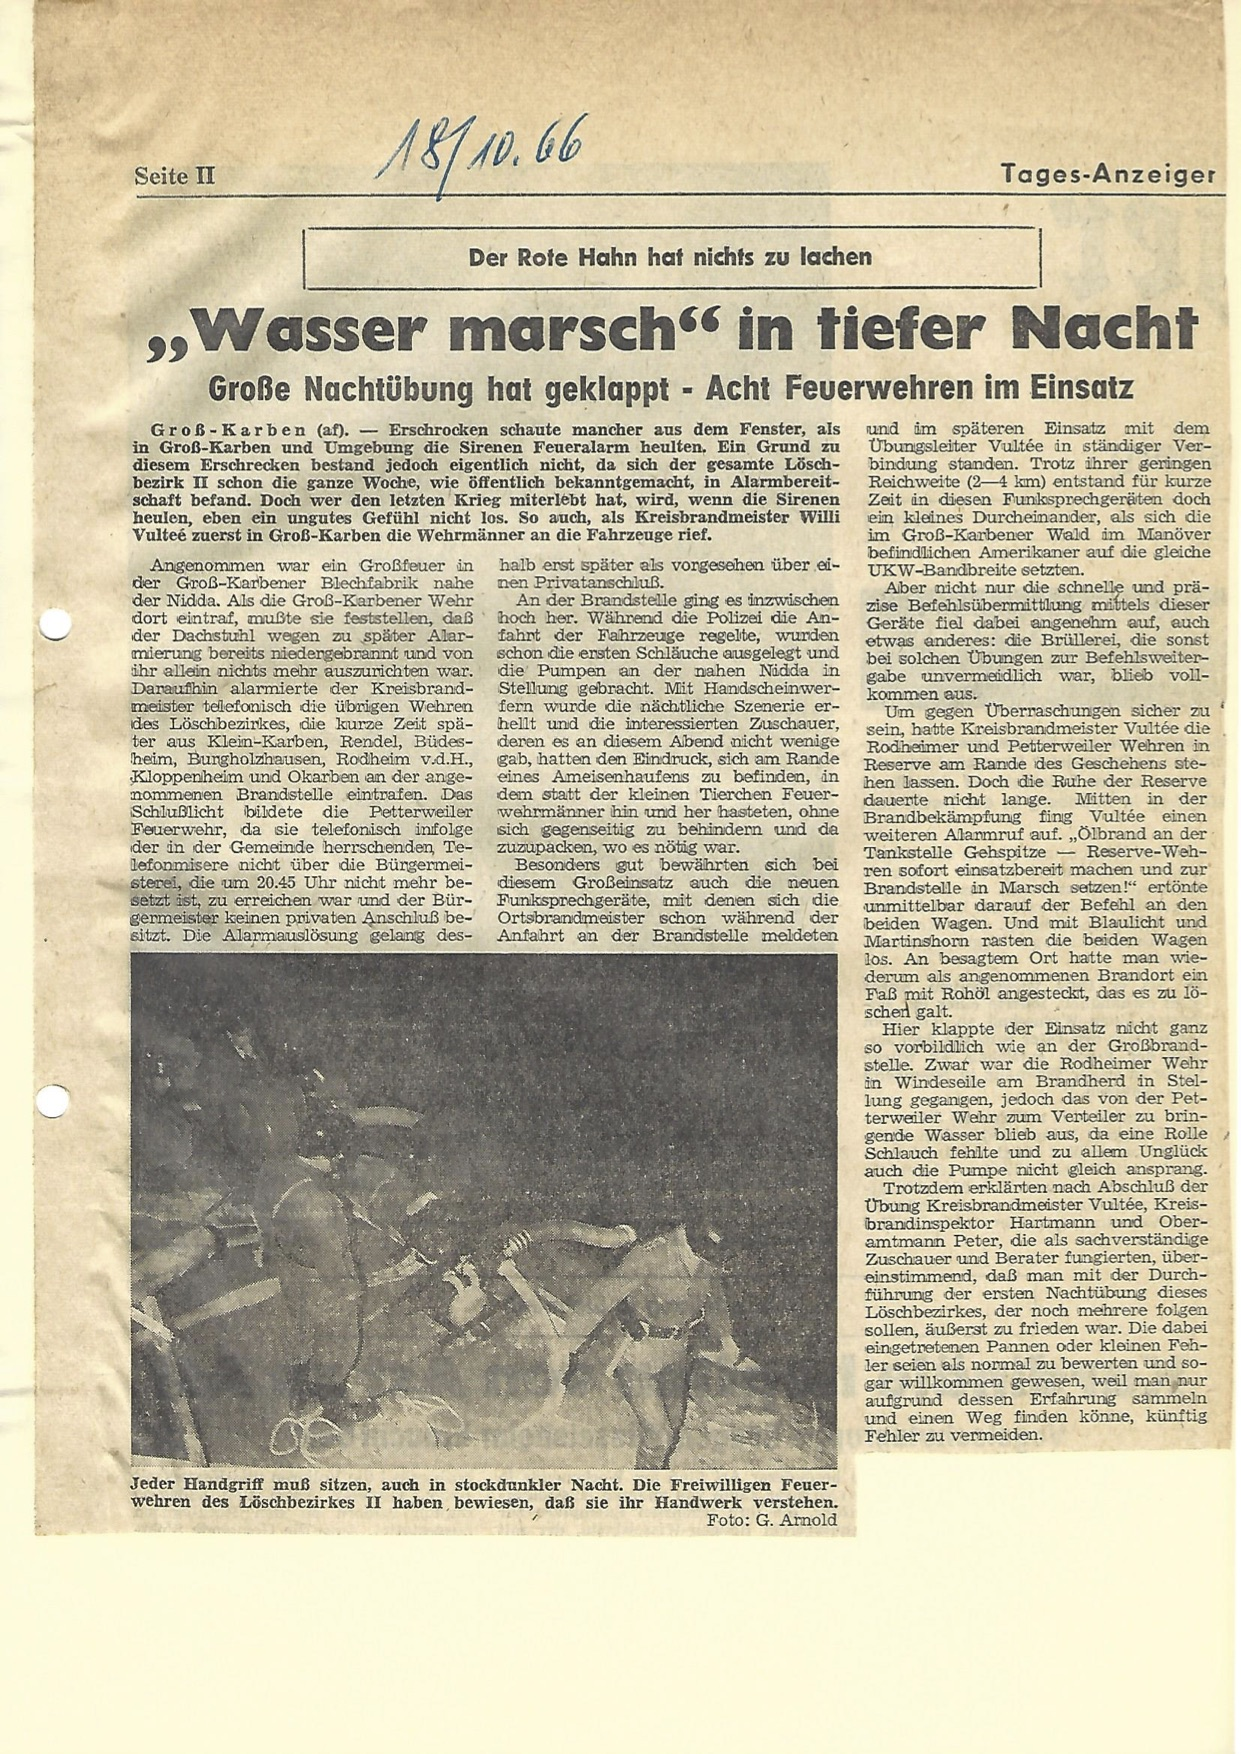 Zeitung 1966